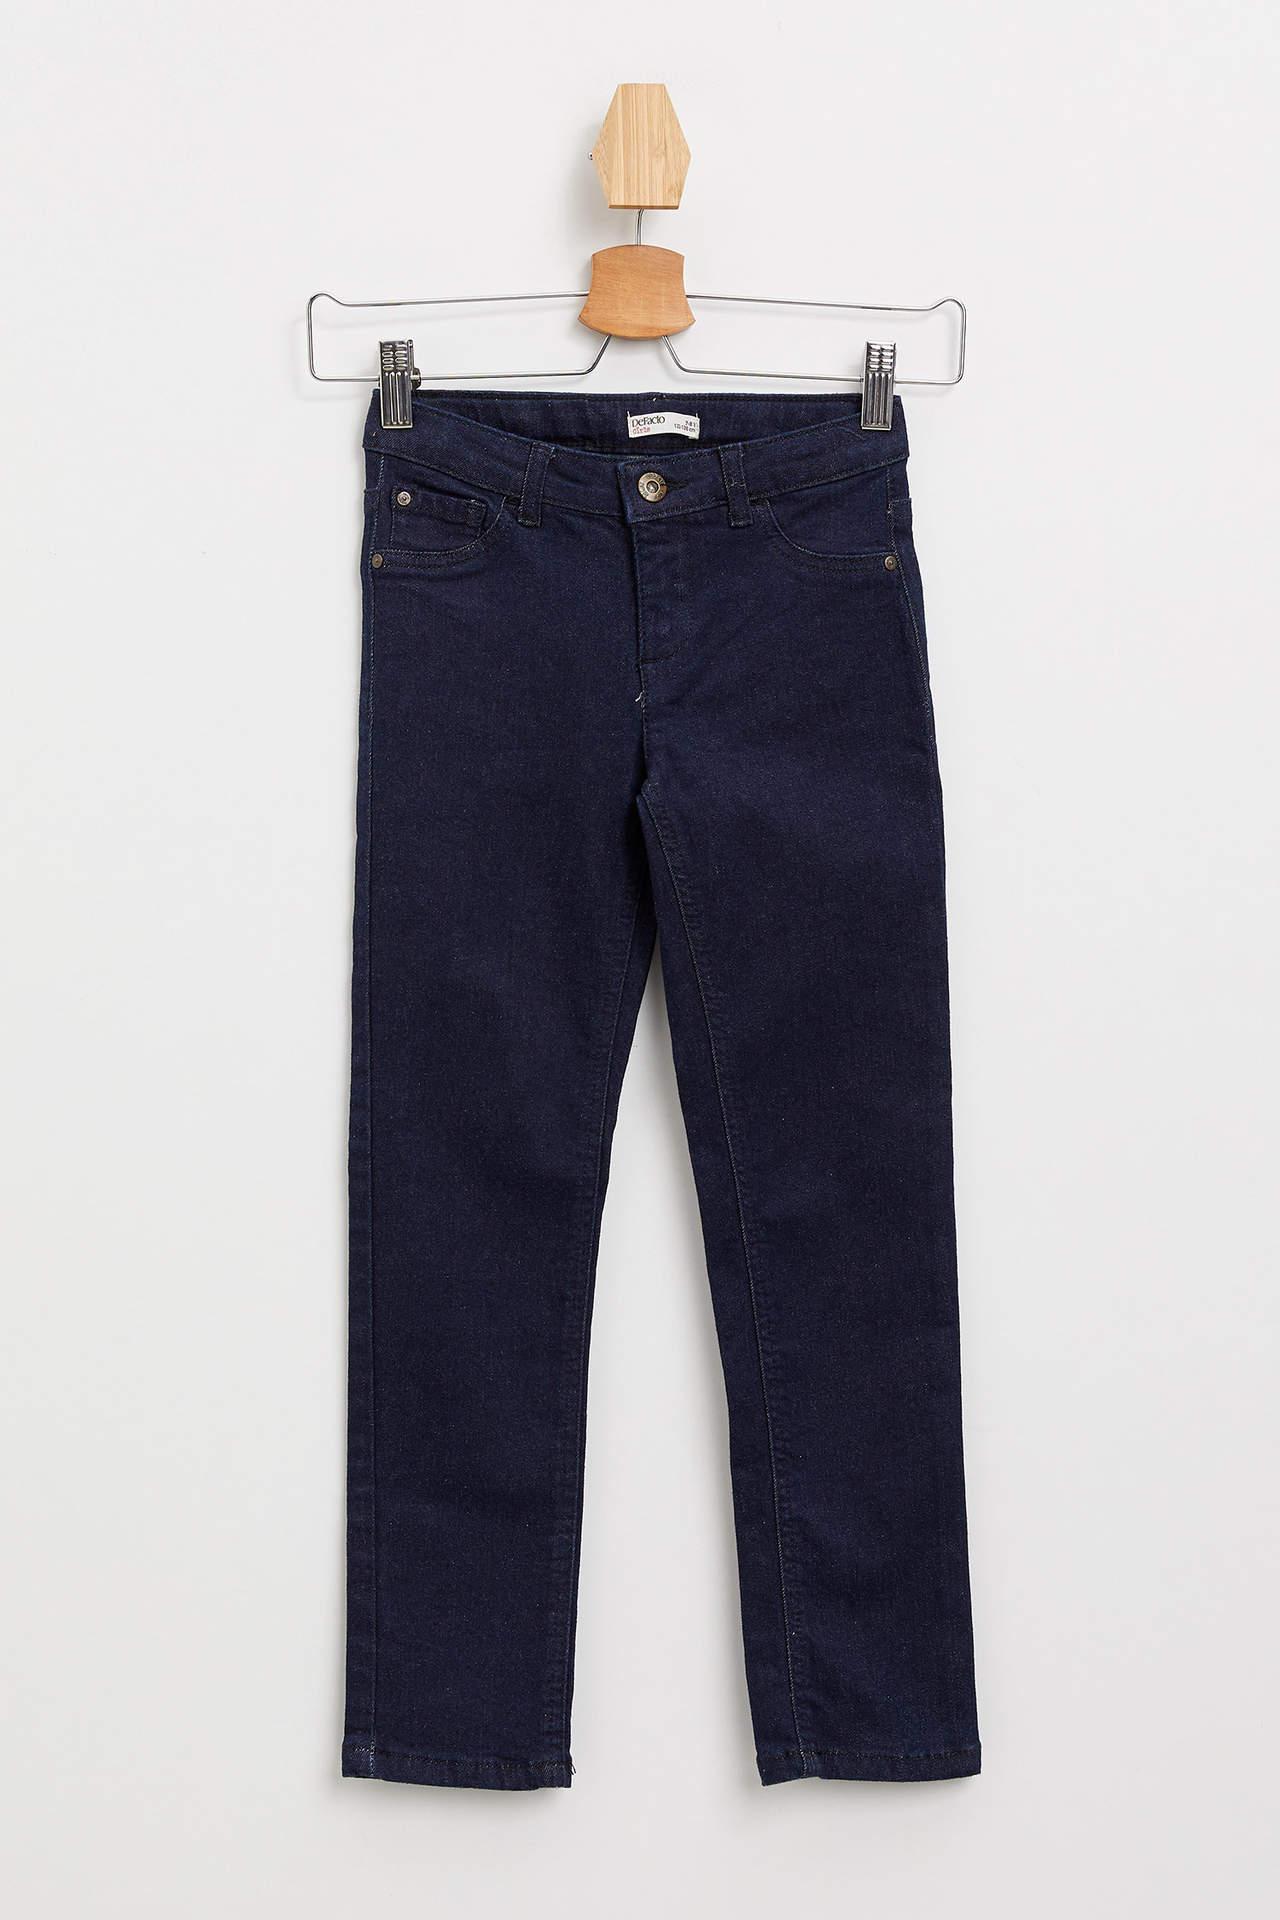 DeFacto Kız Çocuk Skinny Fit Jean Pantolon Mavi female